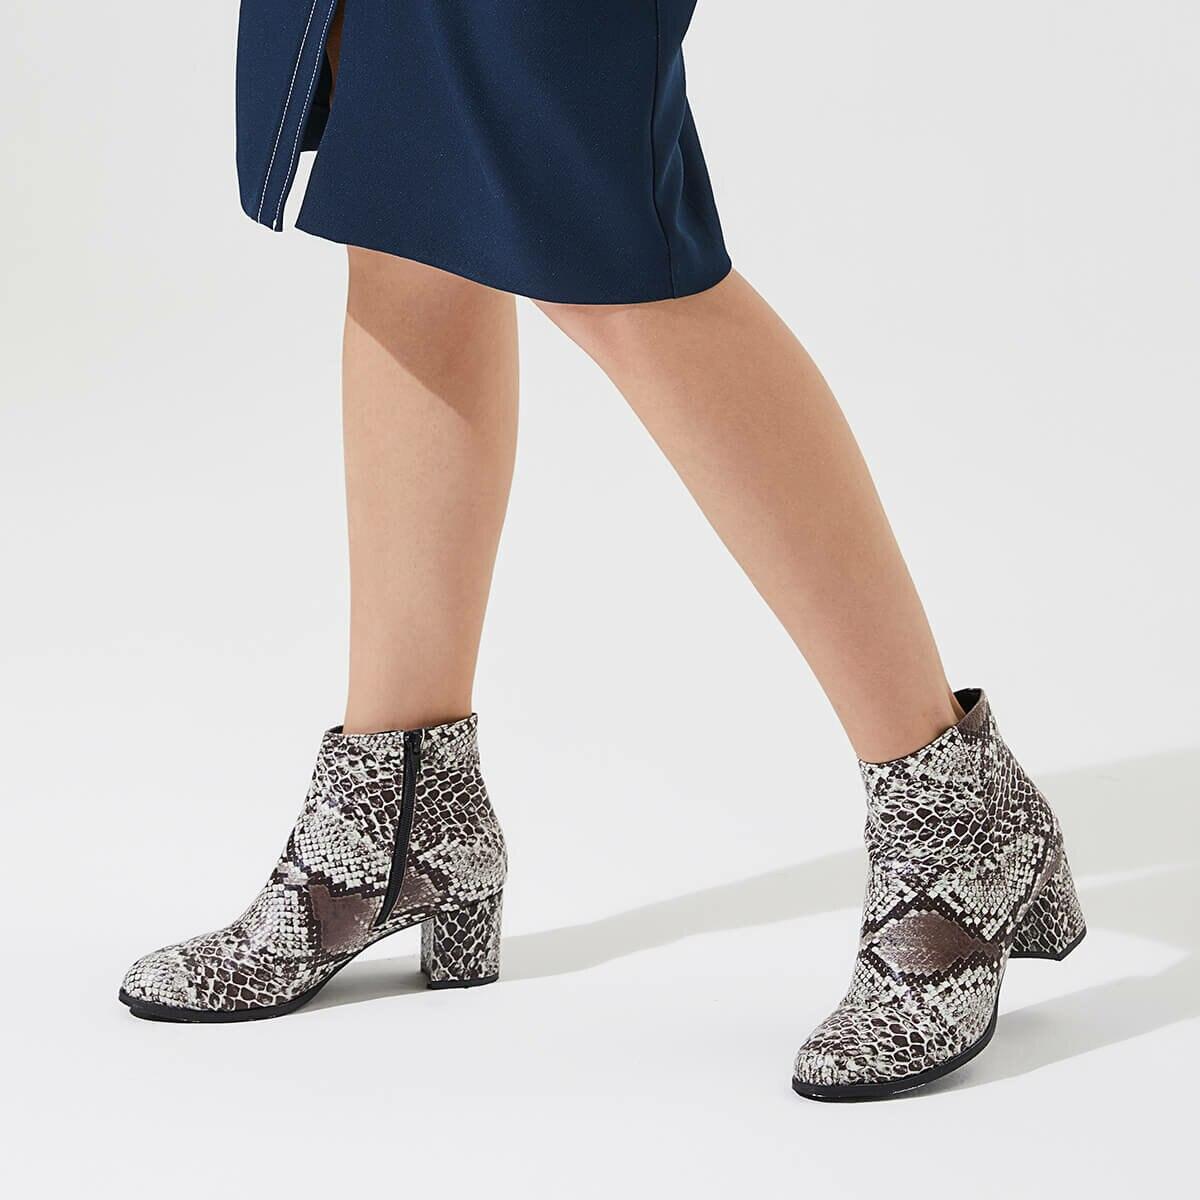 FLO LAURA21Z SKIN Brown Women 'S Boots BUTIGO